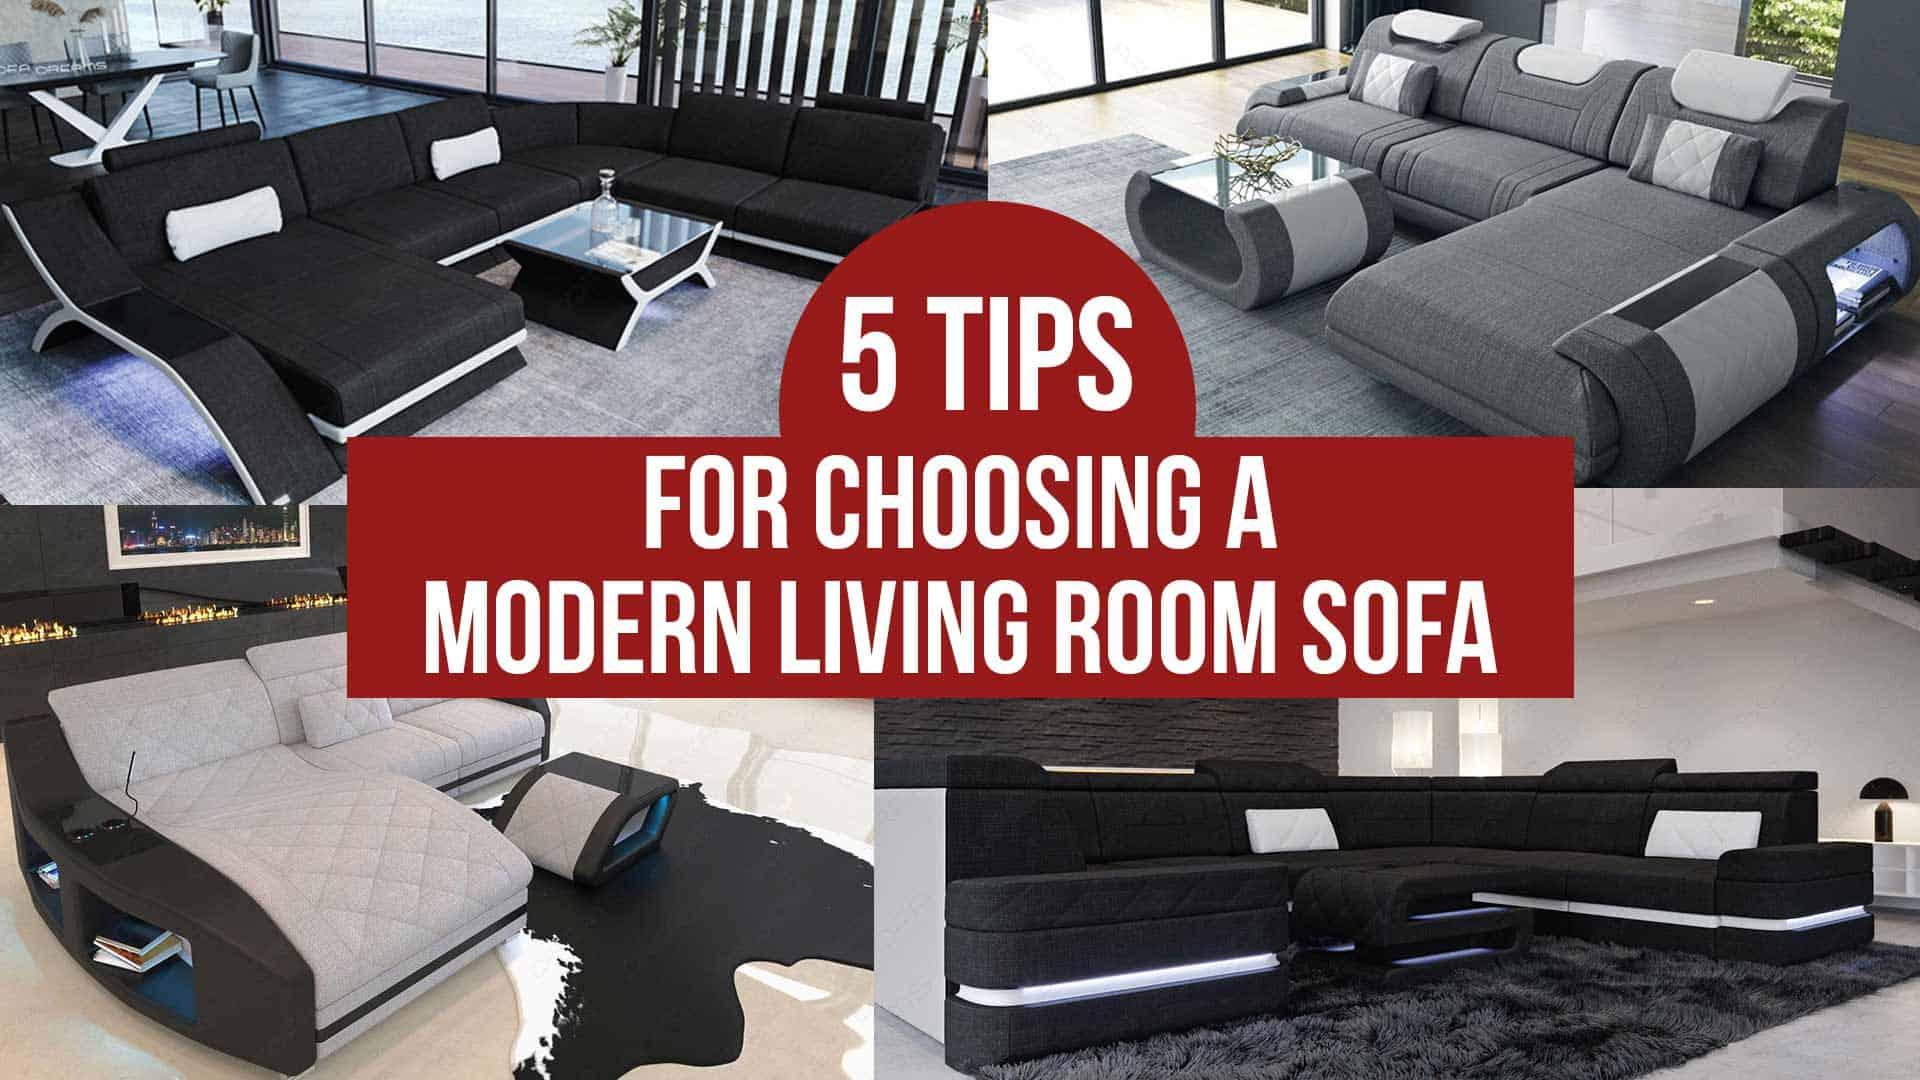 Top 5 Tips for Choosing a Modern Living Room Sofa